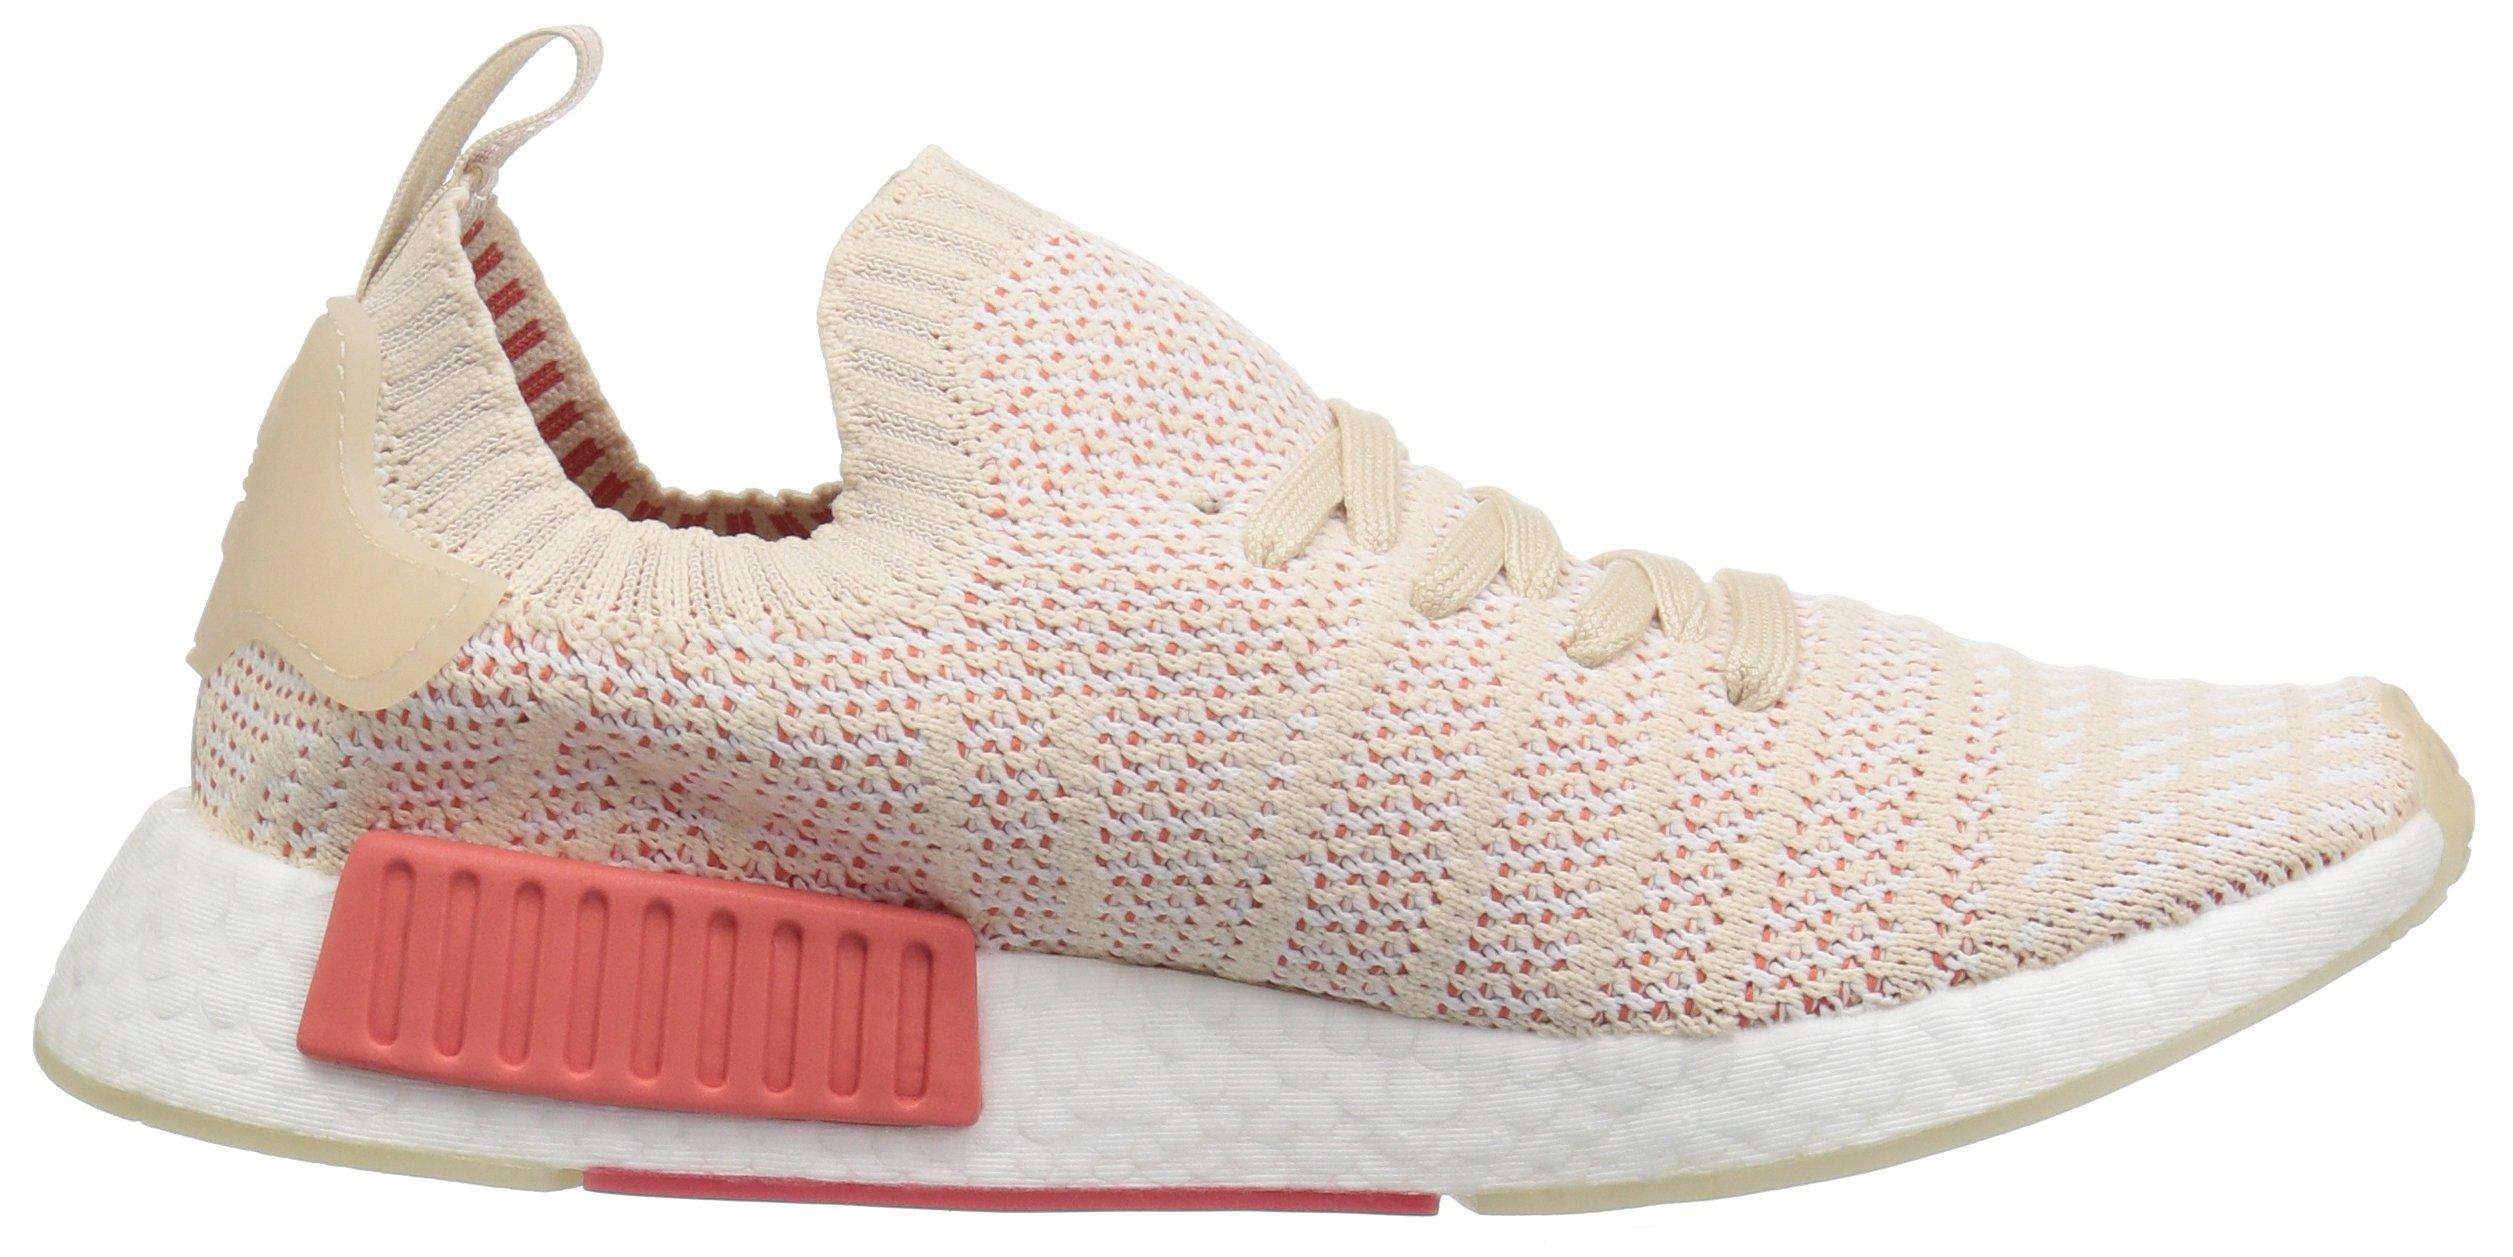 81A%2Byj cbZL - adidas Originals Women's NMD_r1 Stlt Pk Running Shoe